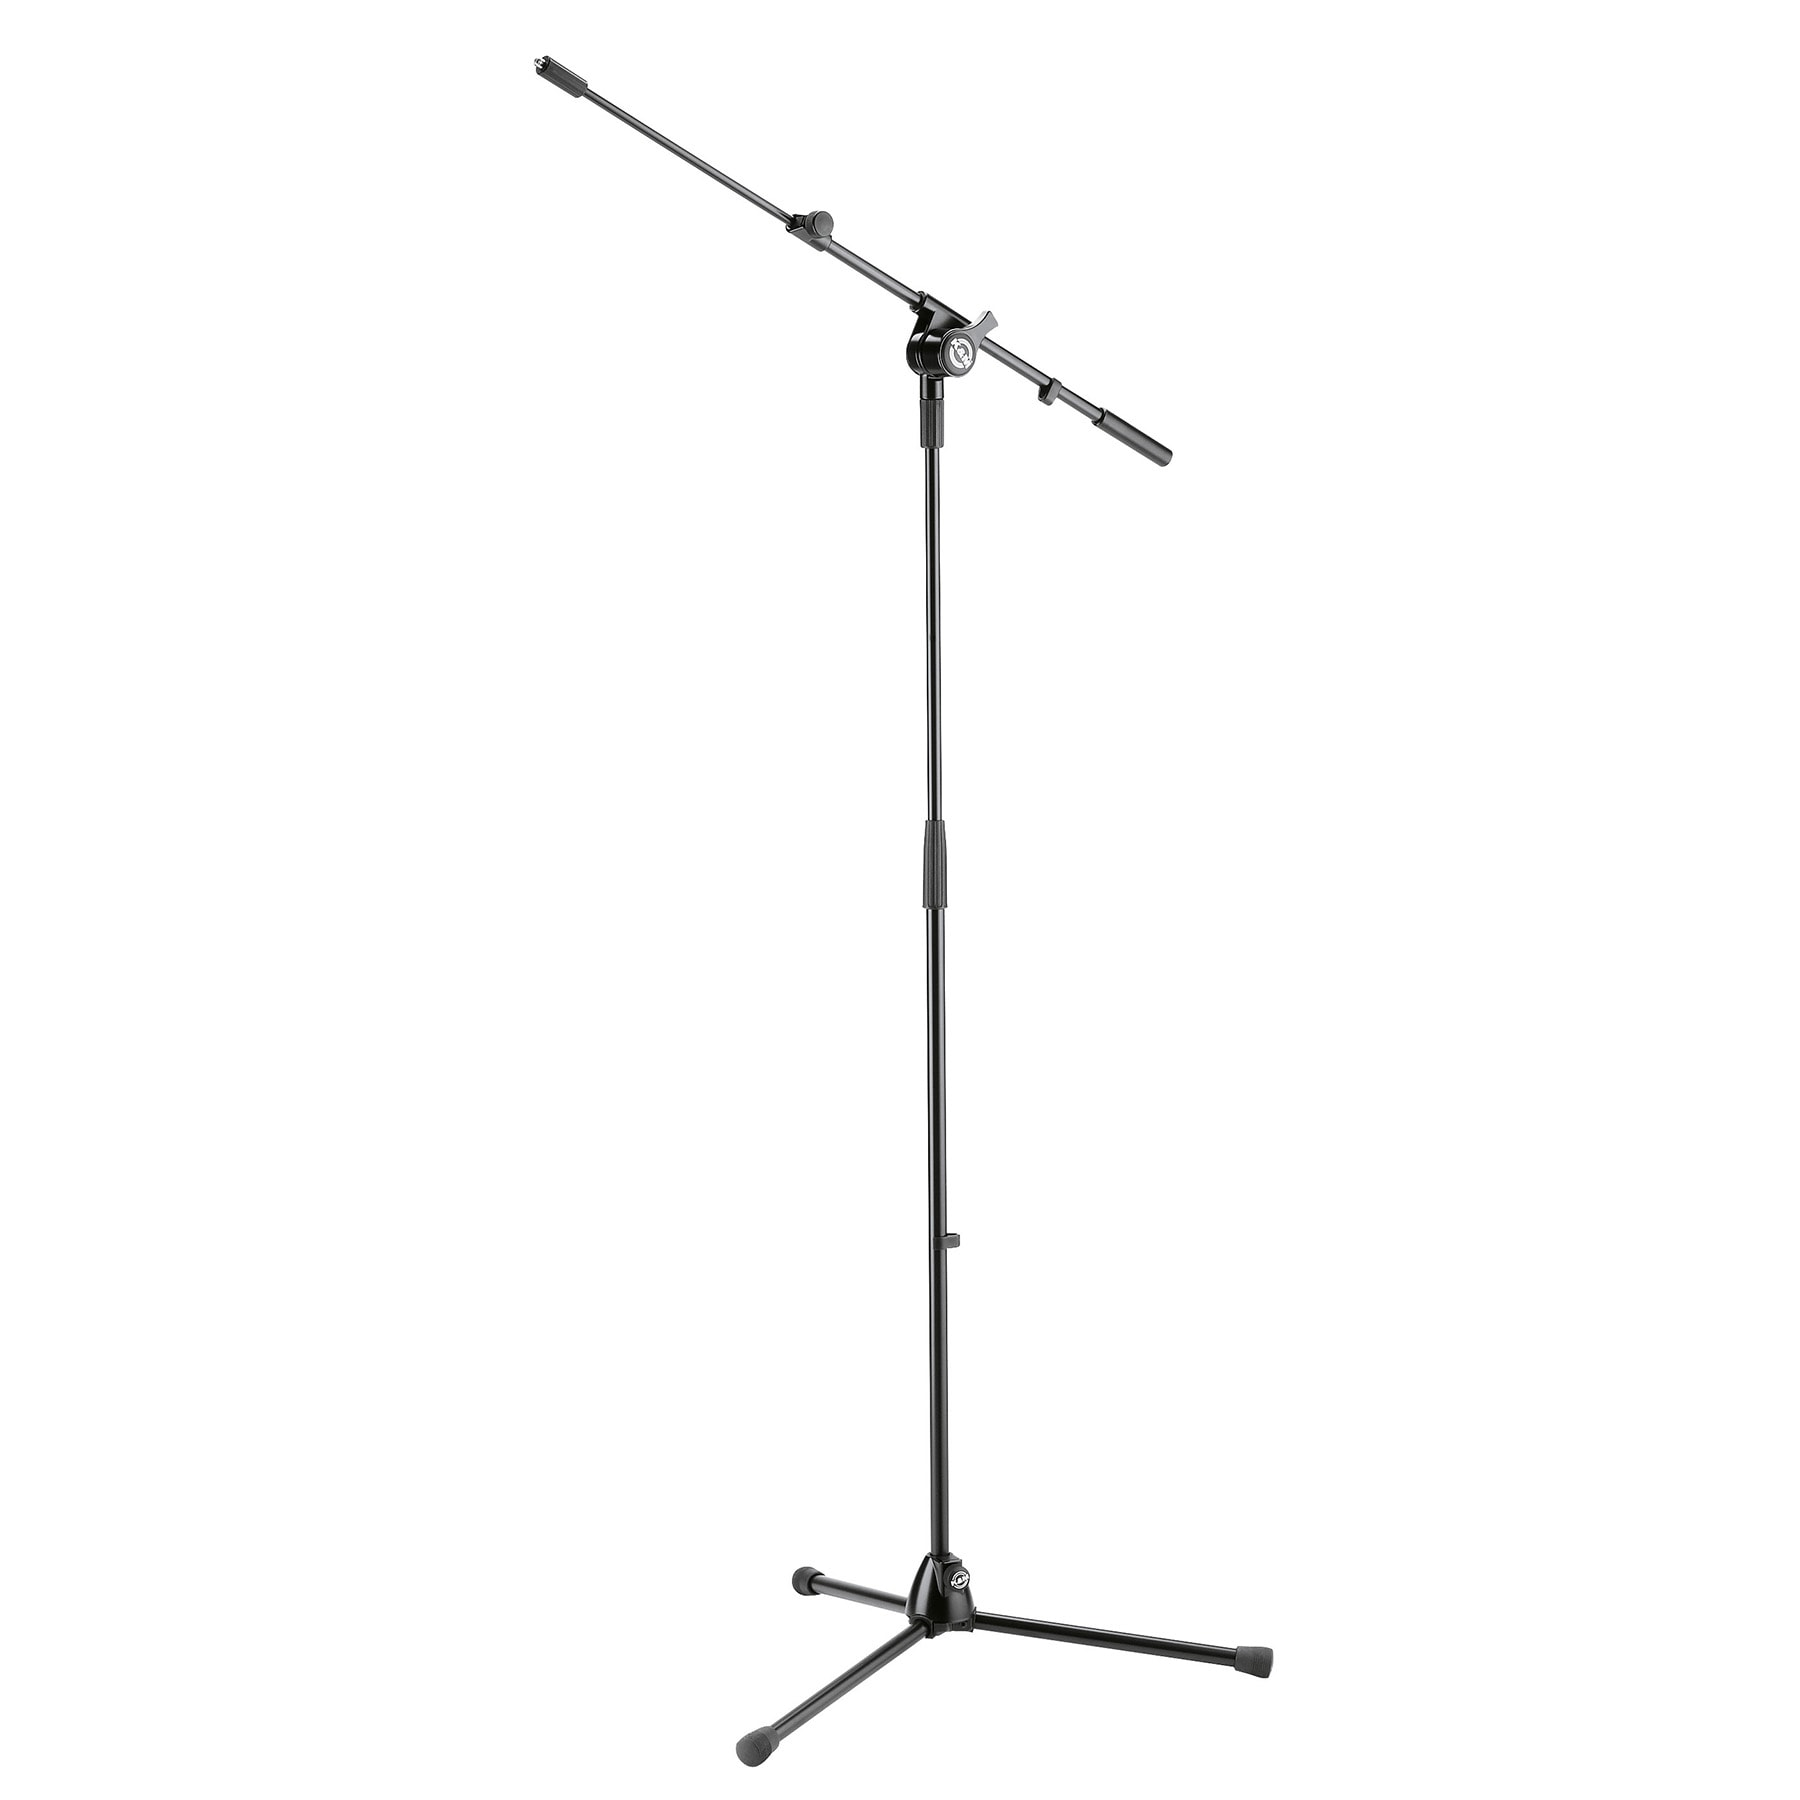 KM25600 - Microphone stand